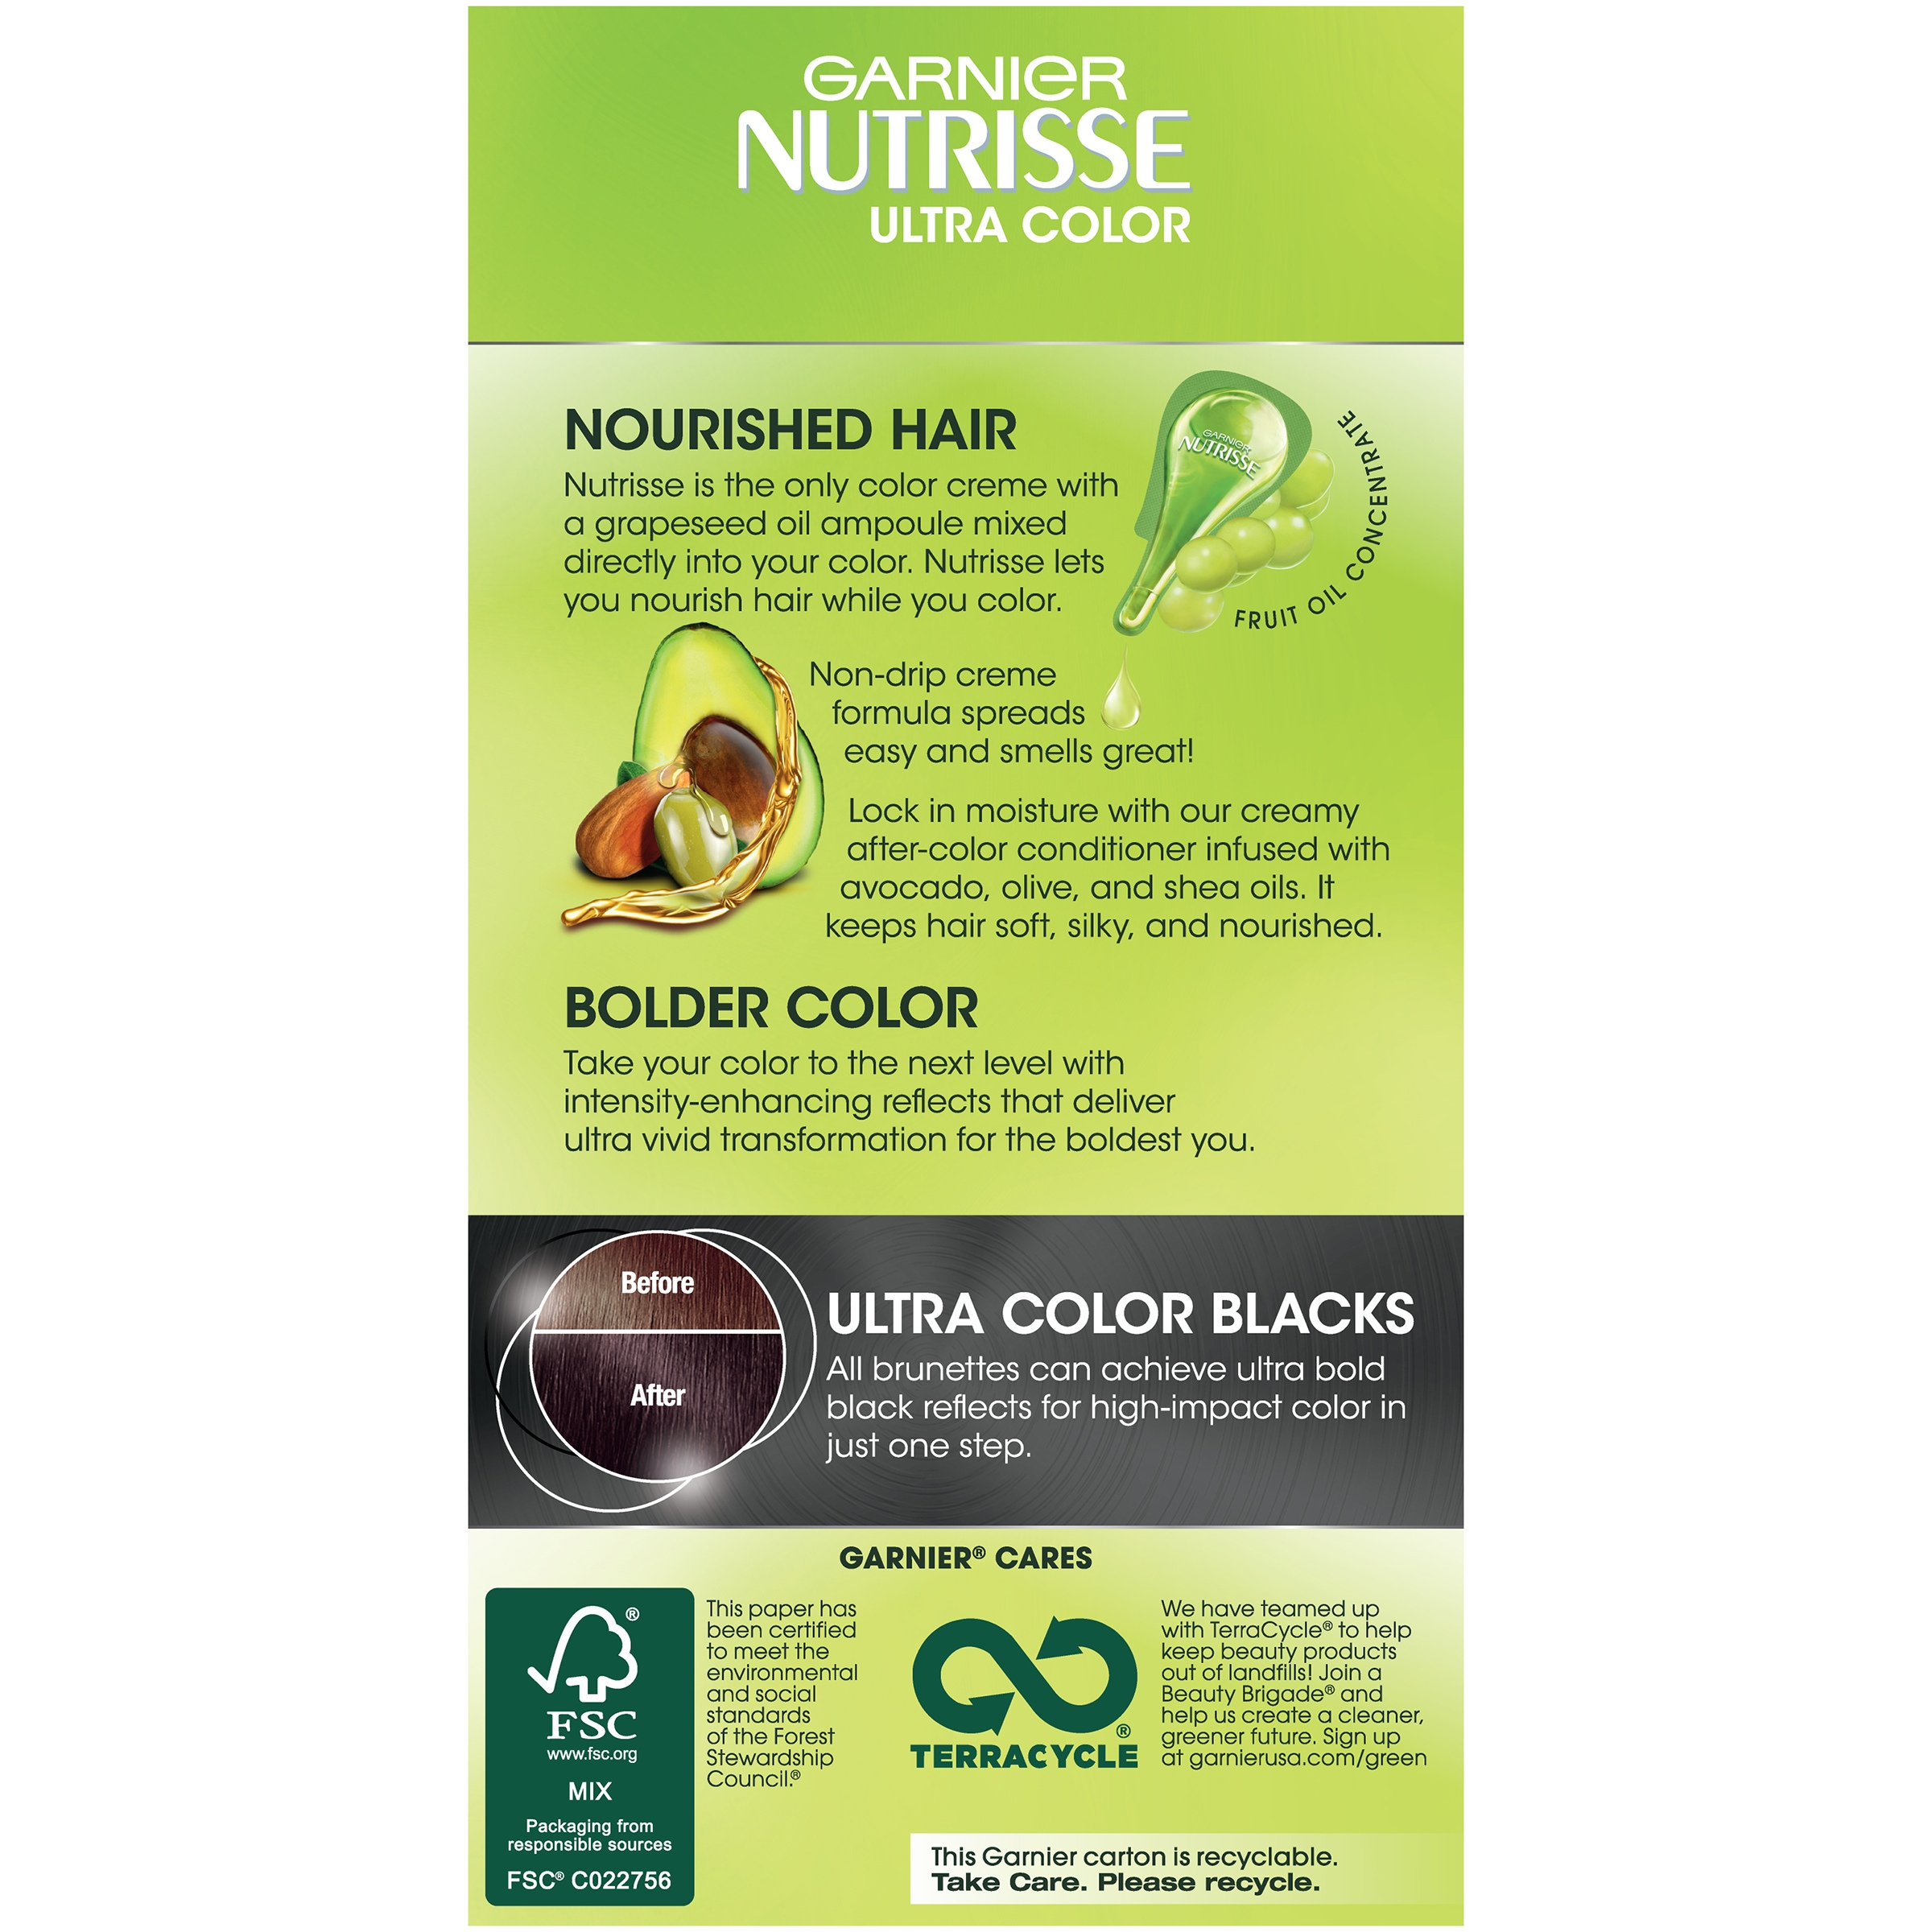 Garnier Nutrisse Ultra Color Nourishing Hair Color Creme - Walmart.com